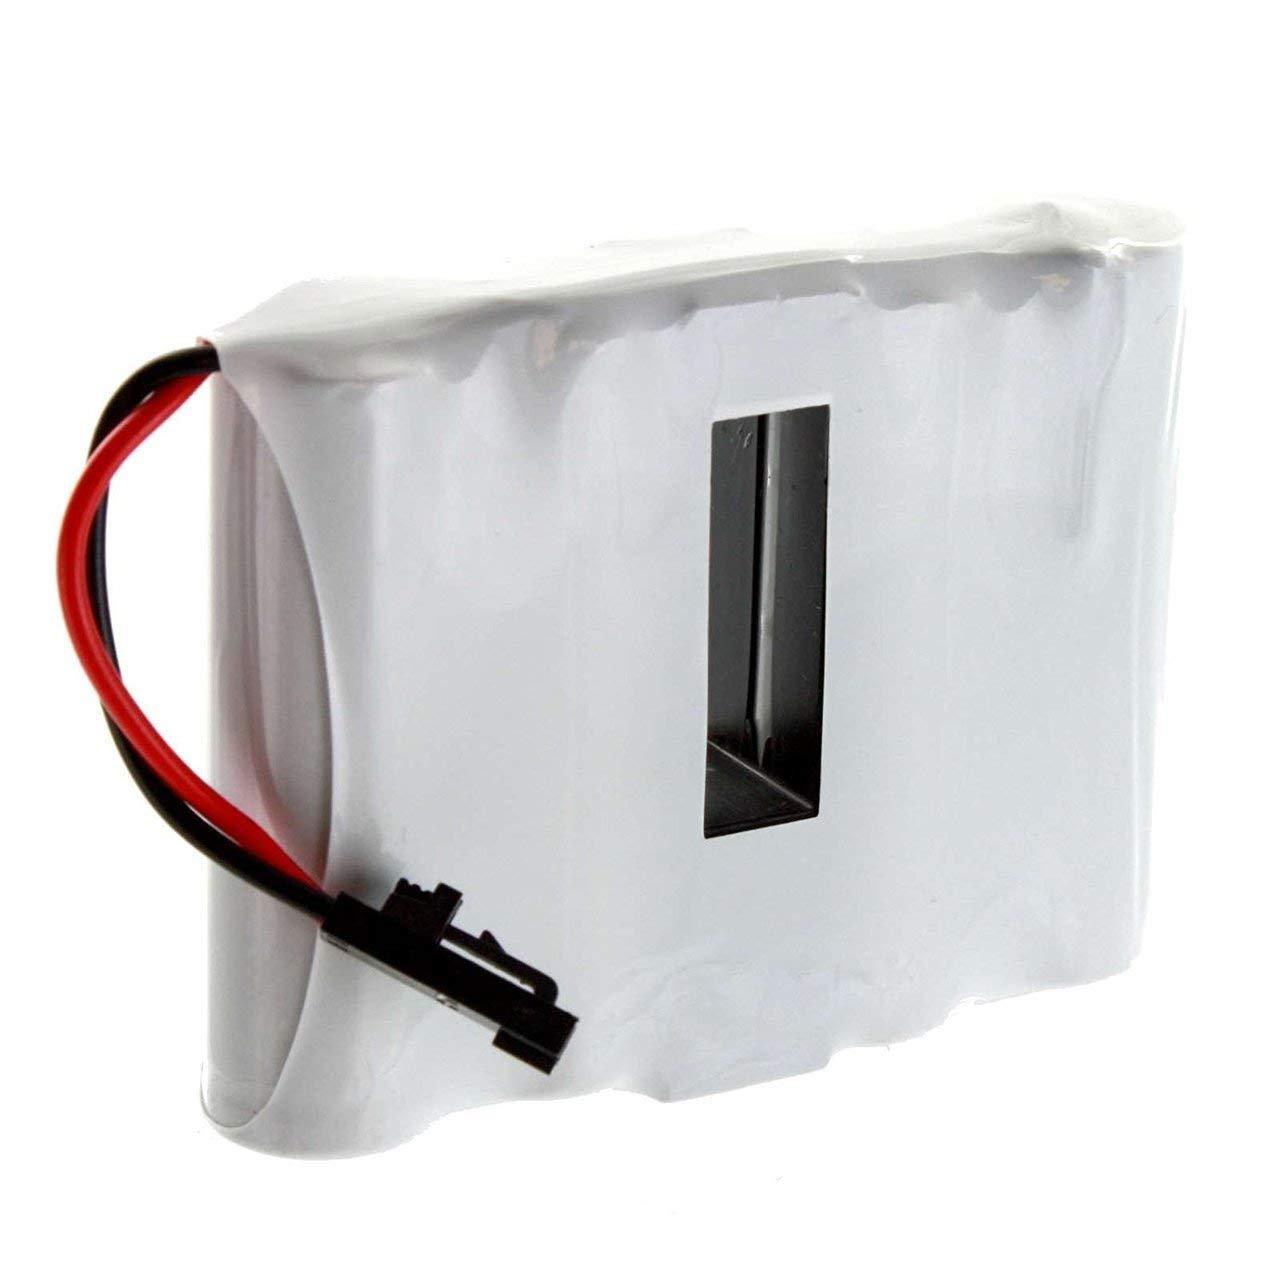 DL-2 Alkaline 6V Saflok HTL1 Style B Door Lock Batteries 54990, box of 24